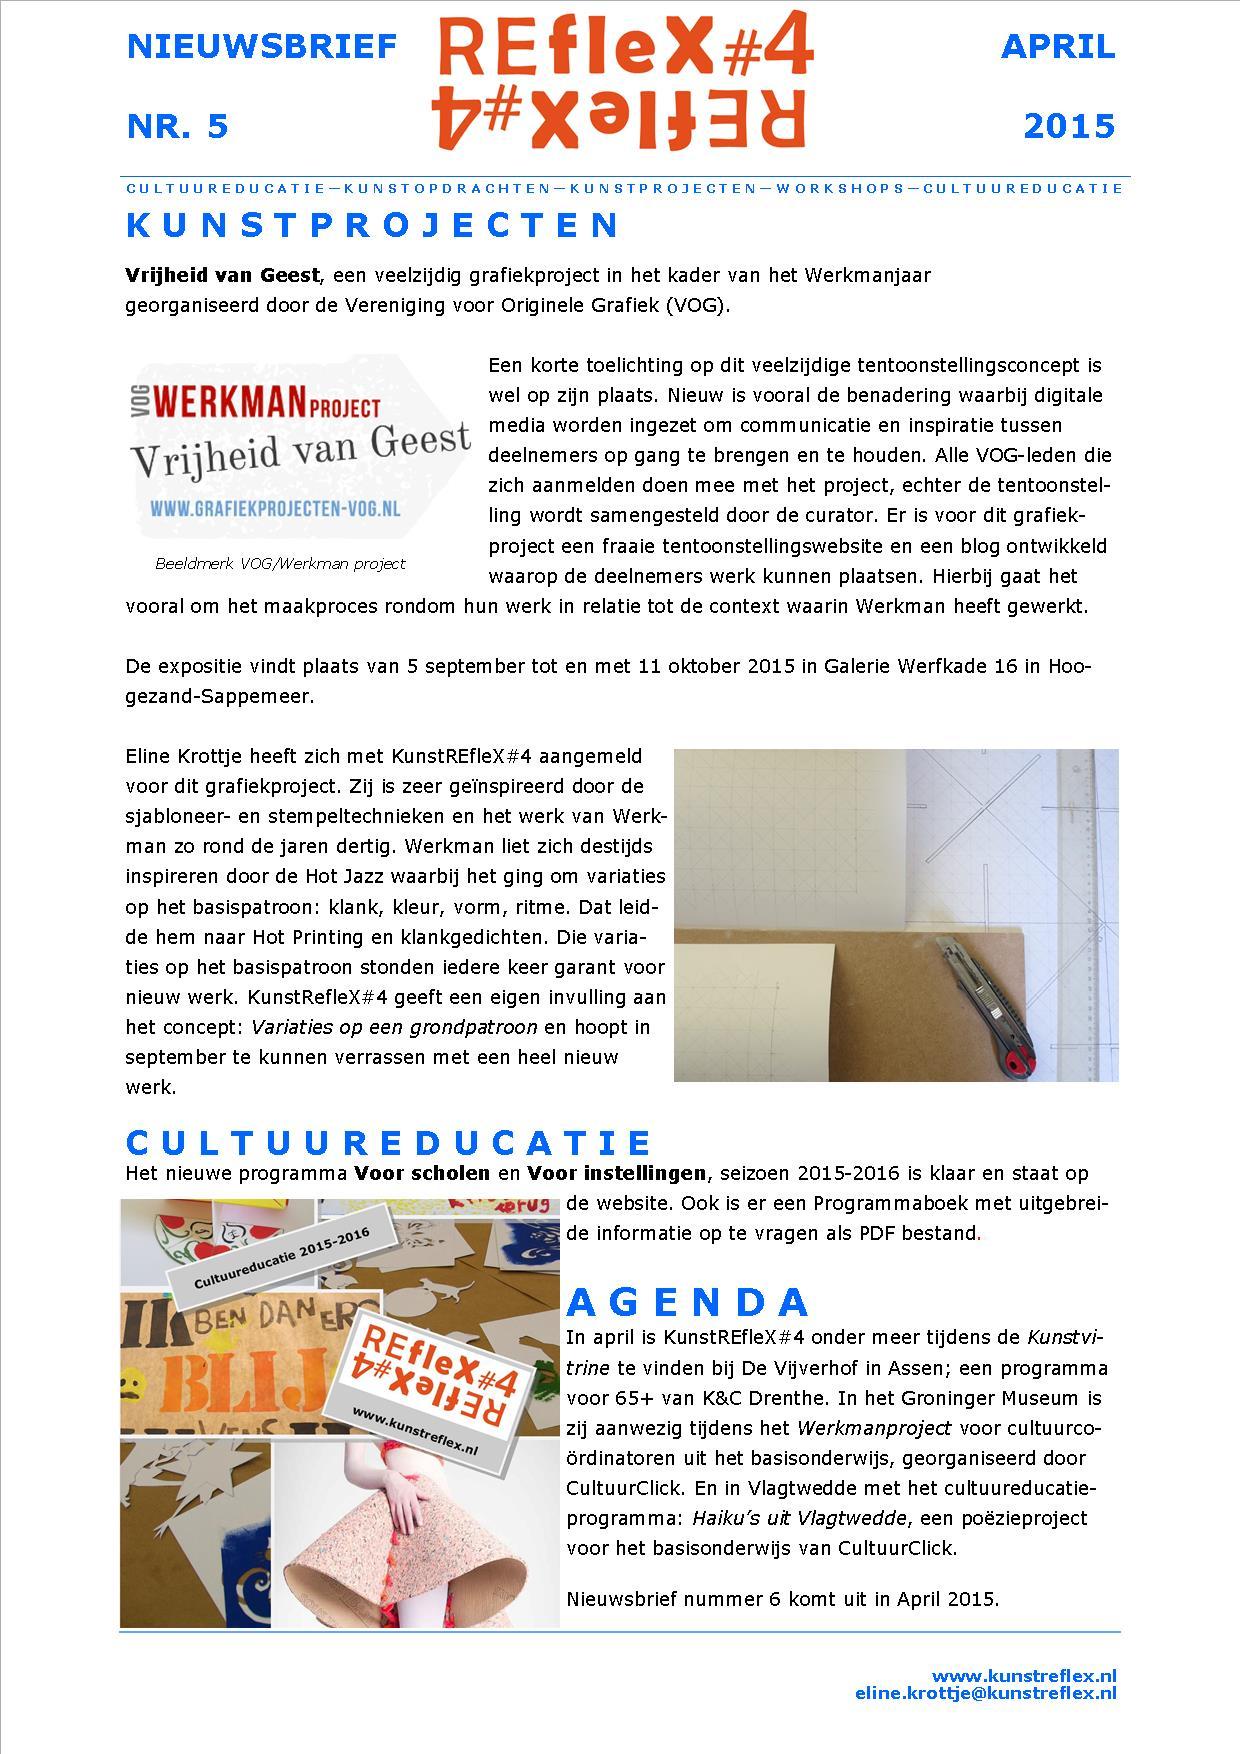 nieuwsbrief KunstREfleX#4, nr 5